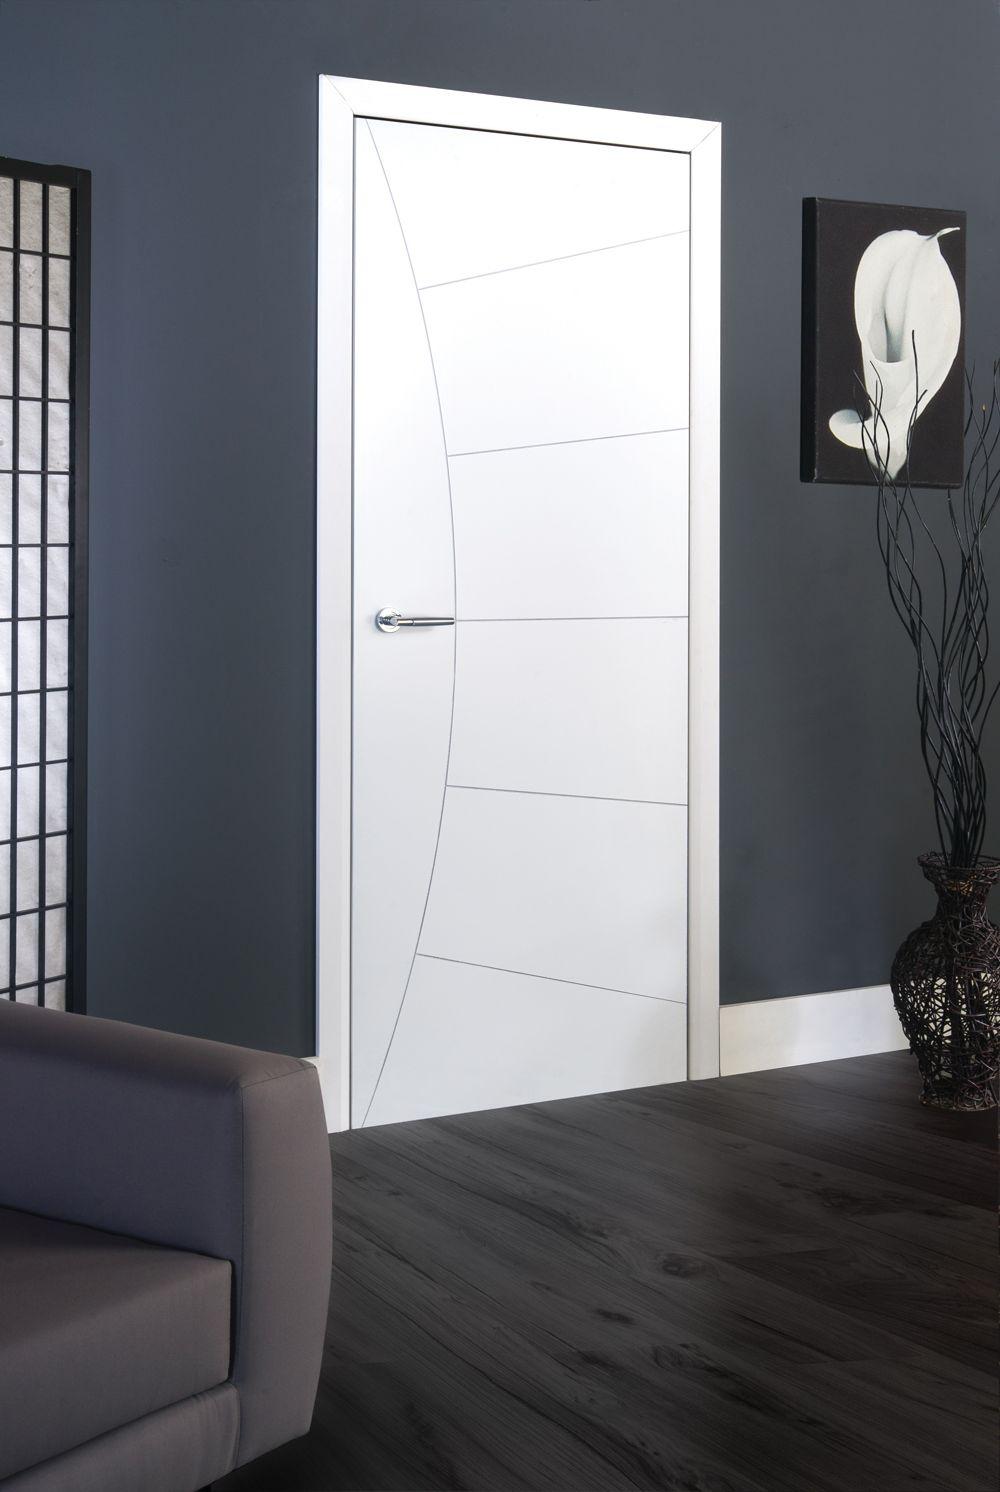 Cool and stylish white internal door with sunshine style grooved cool and stylish white internal door with sunshine style grooved pattern jb kinds limelight rubansaba